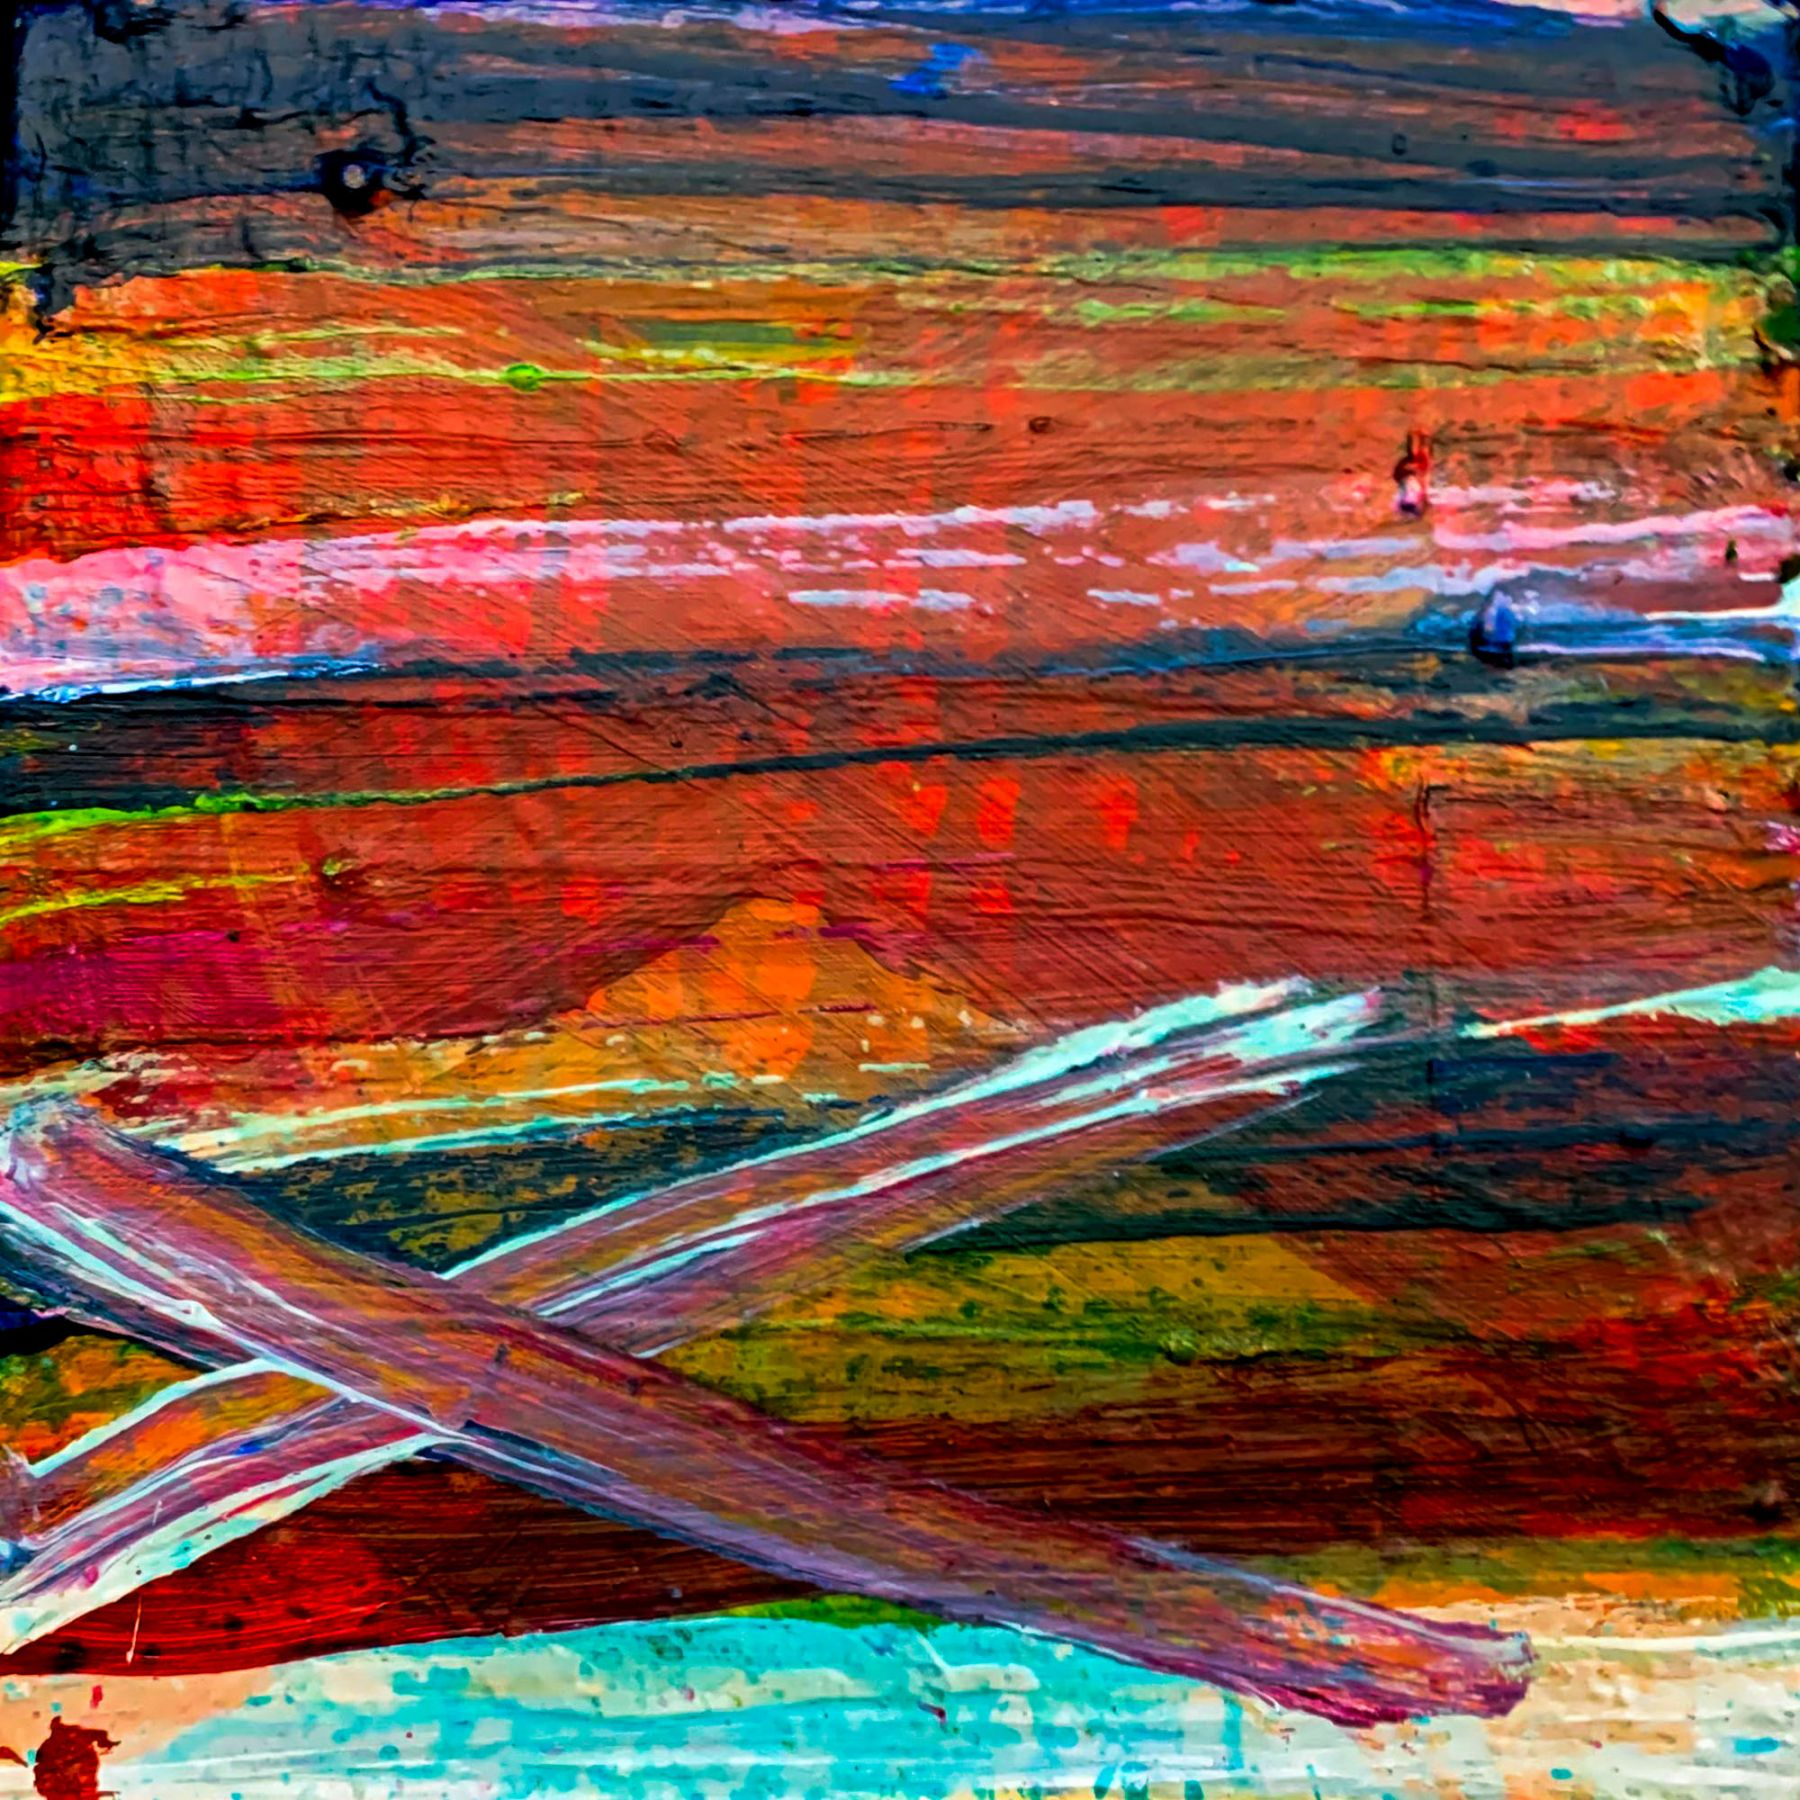 Willie Mutton  Stripe Cross Colour, 2019